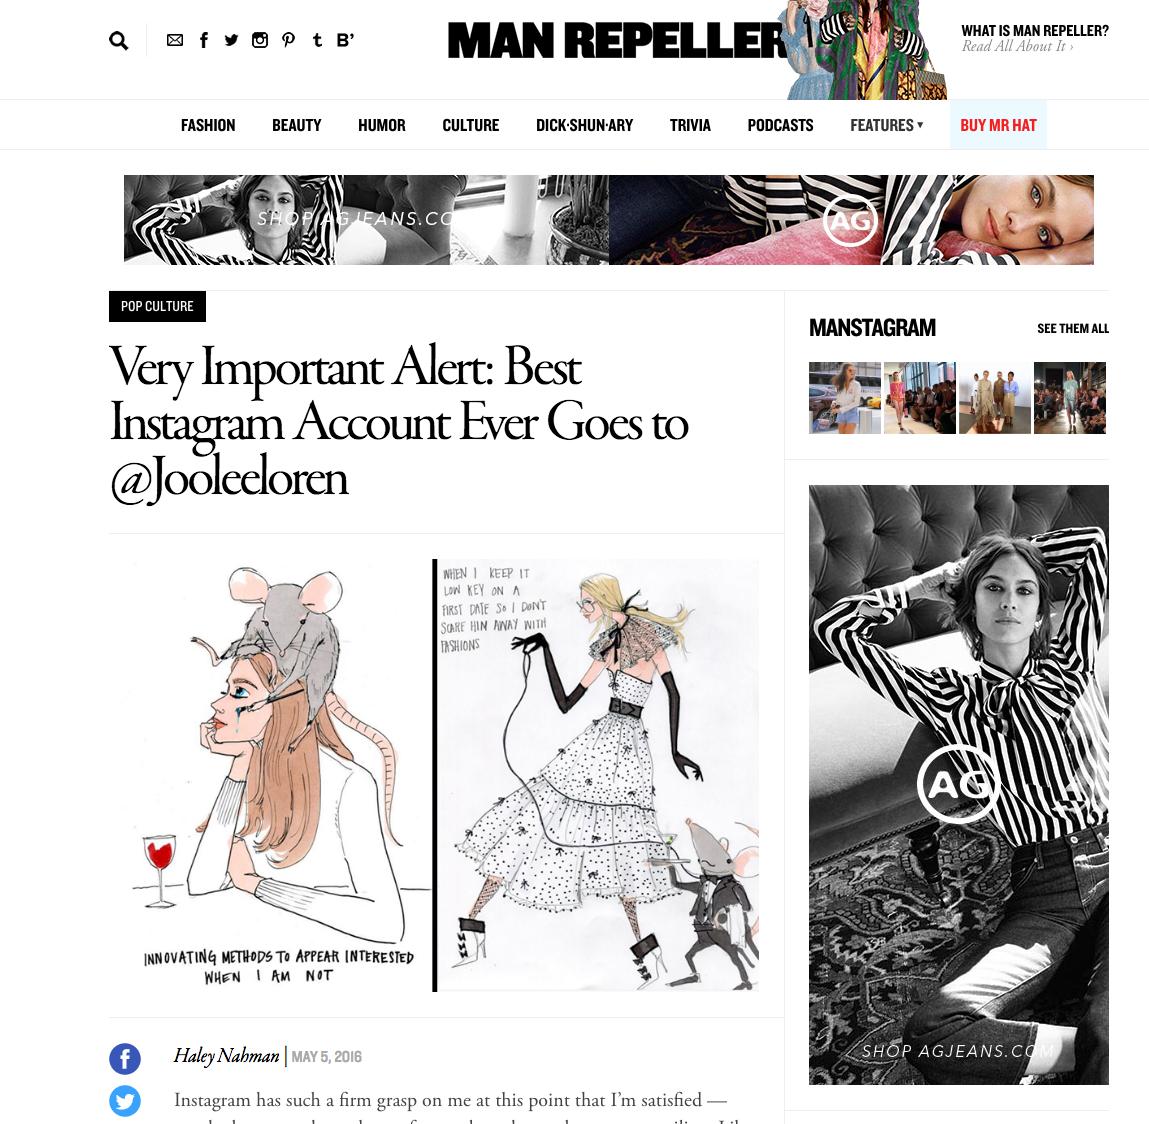 Featured on Manrepeller.com